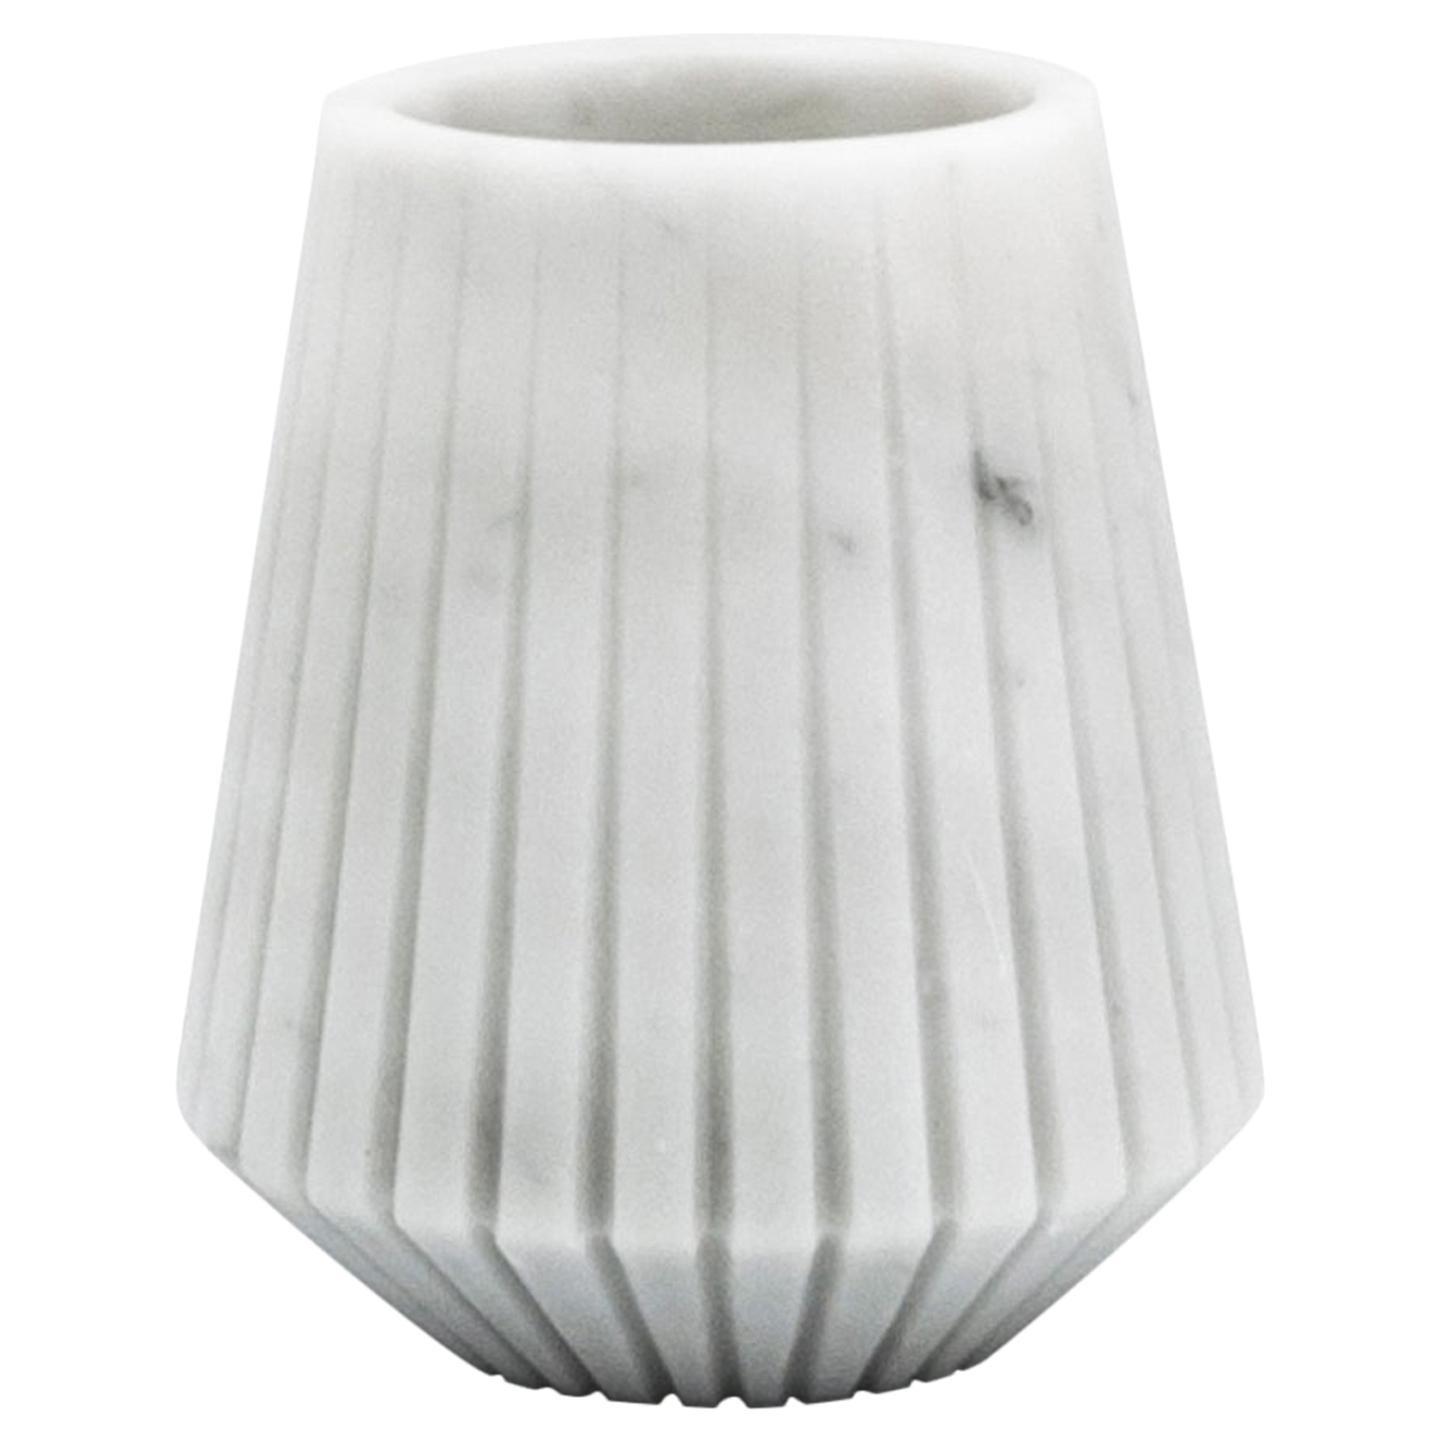 Short Vase in White Carrara Marble